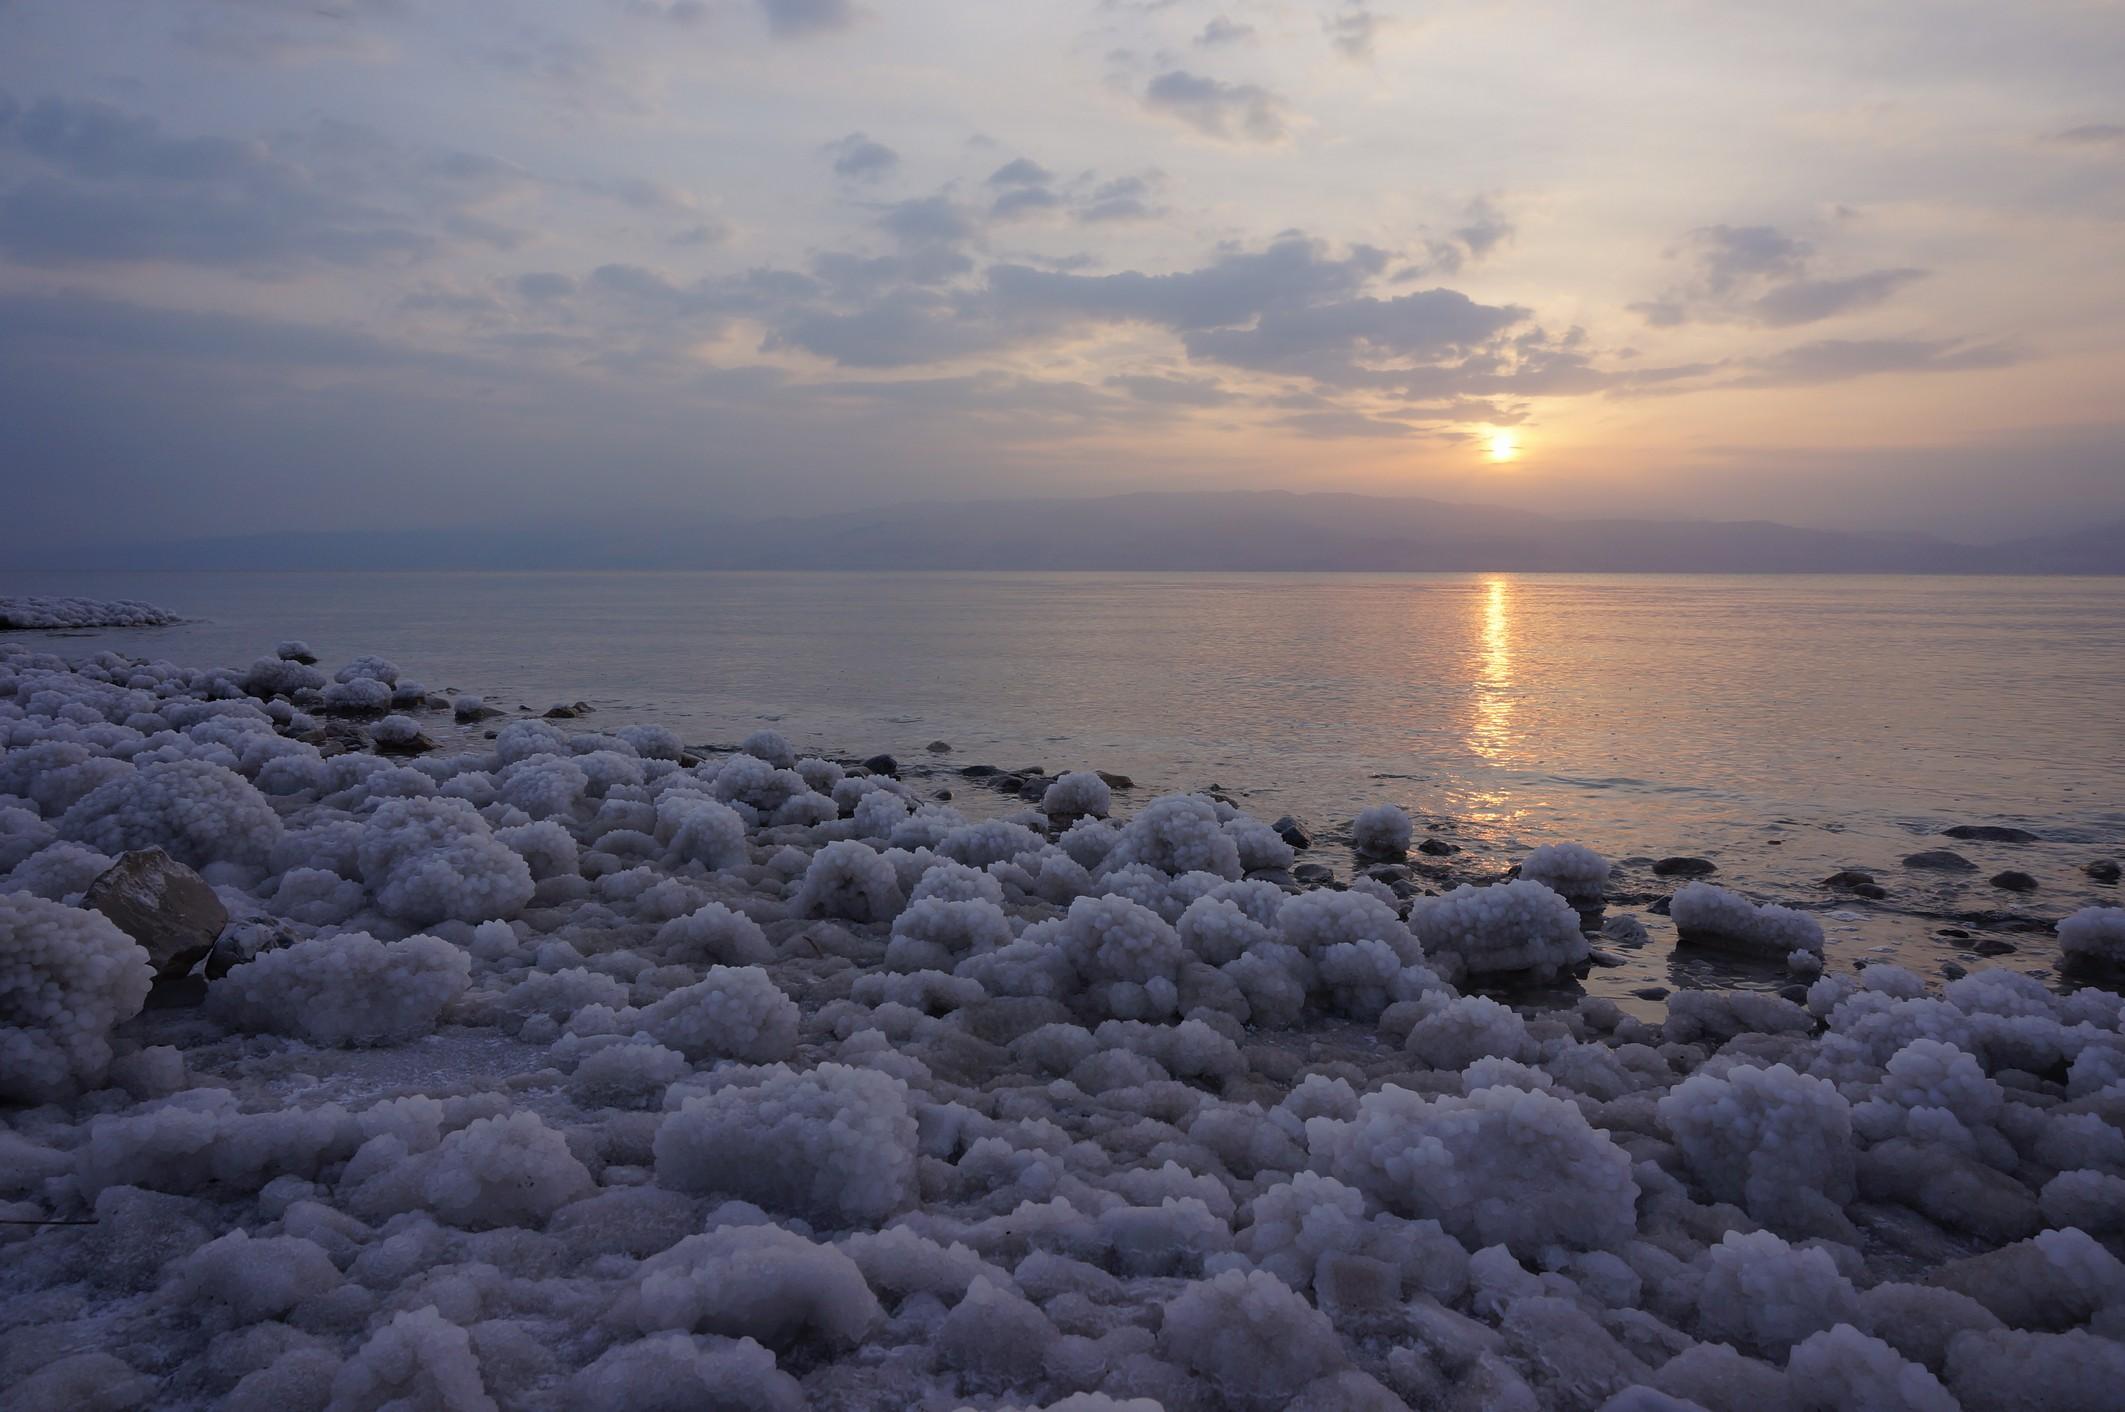 Izrael: Mrtvé moře